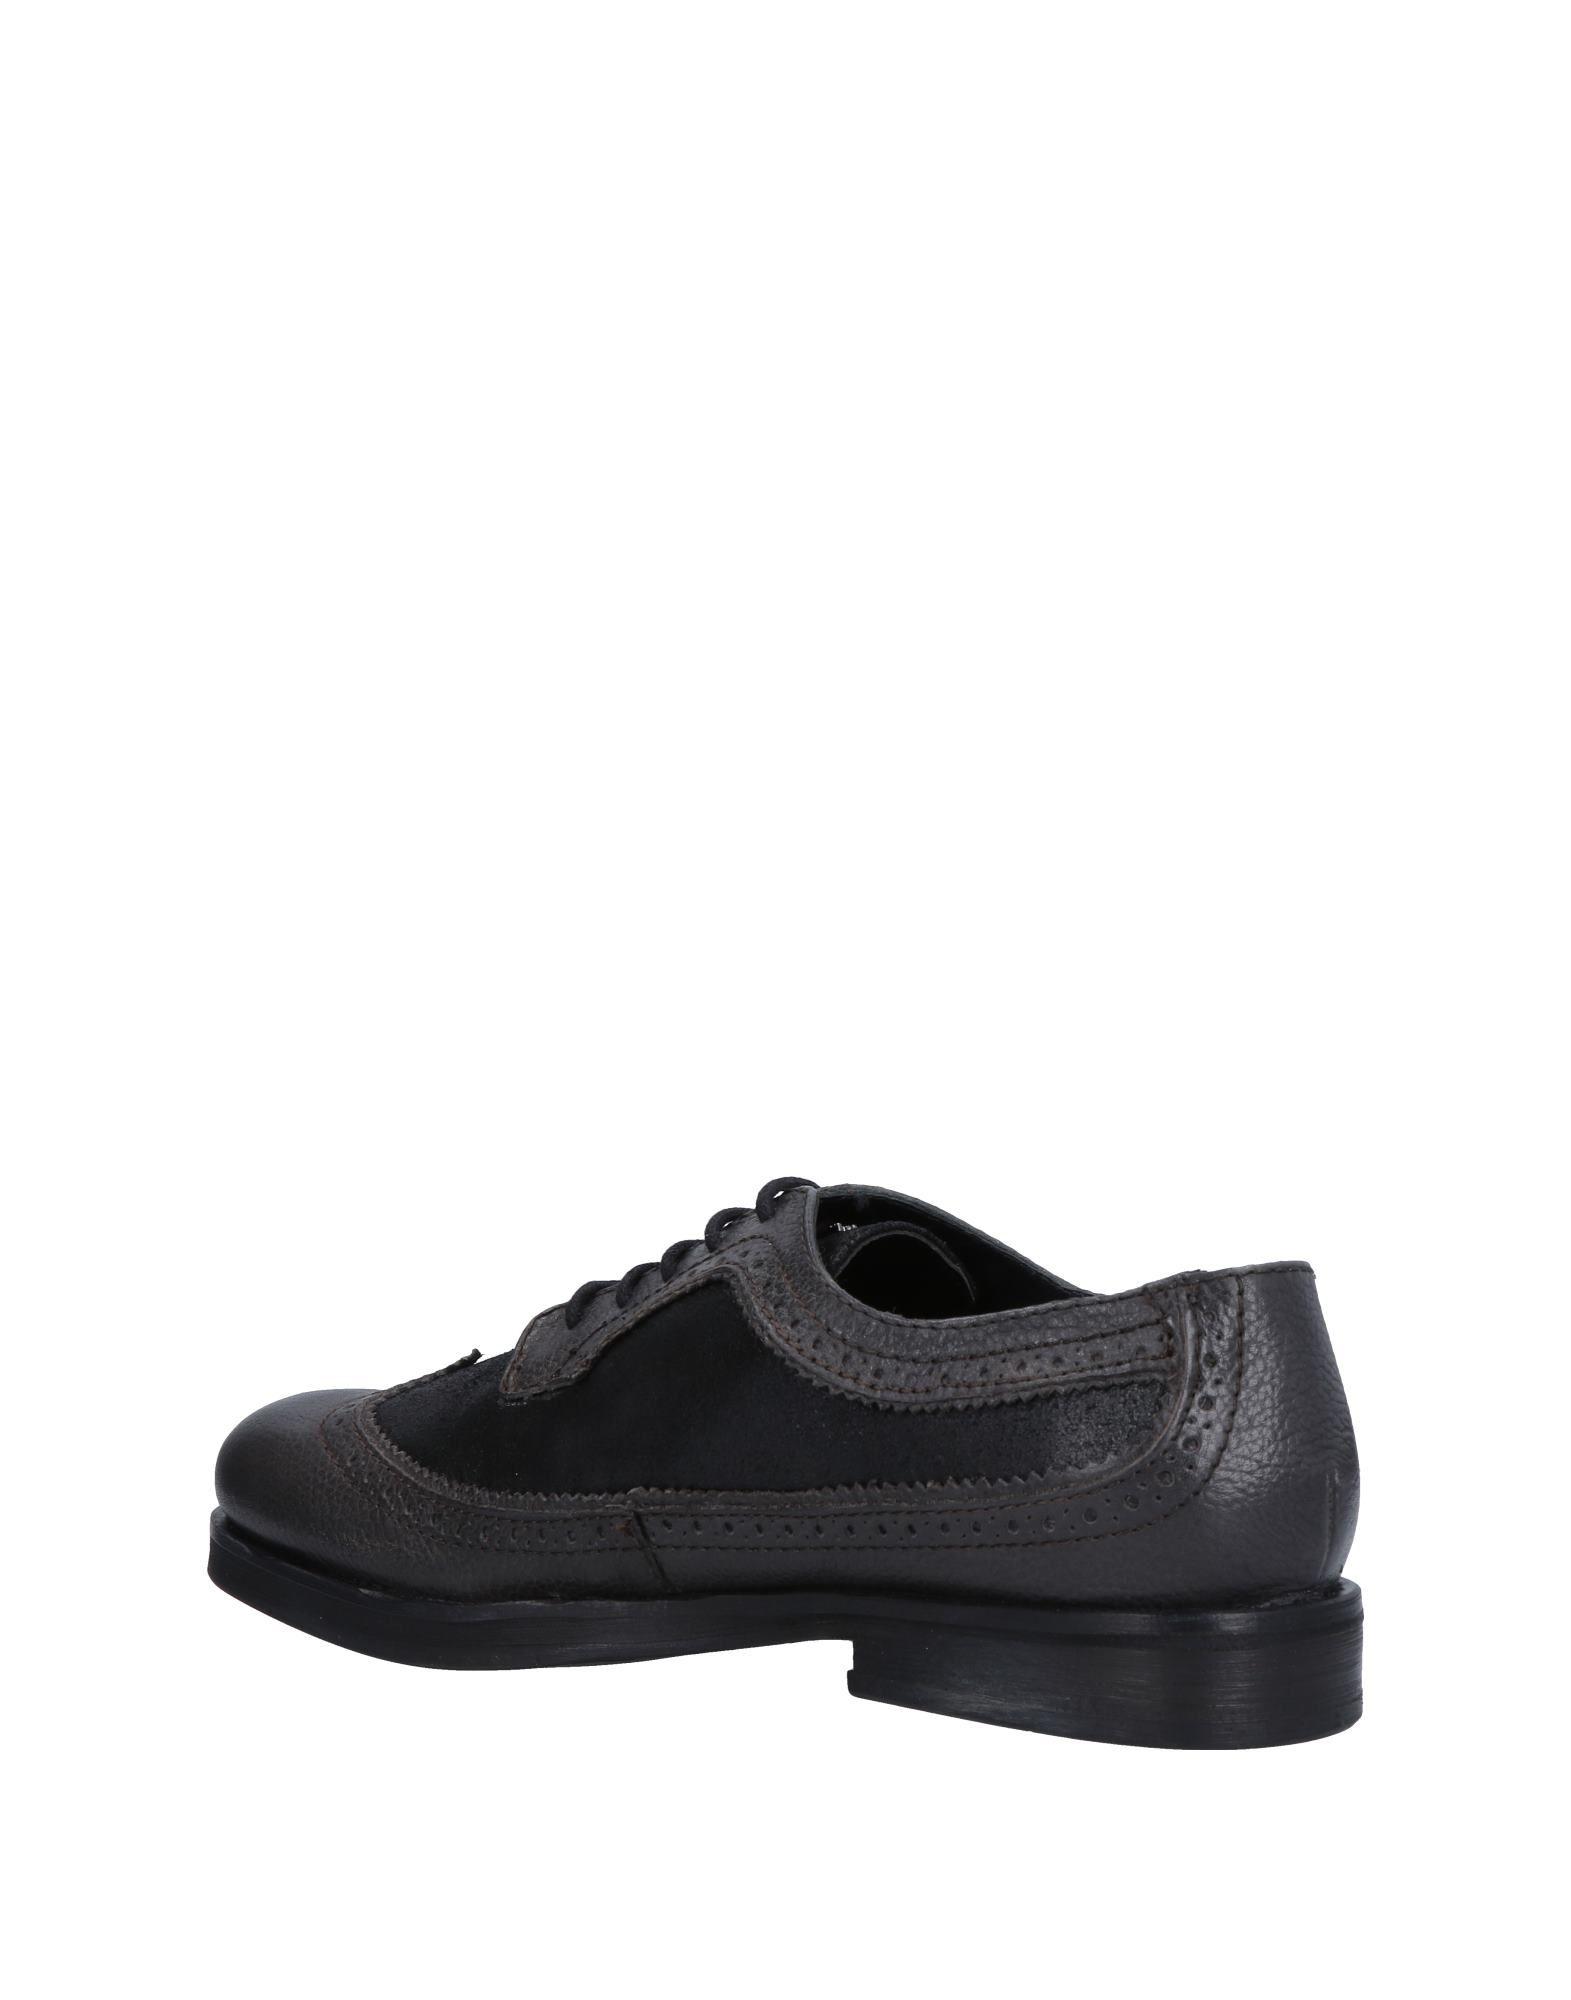 Crime London Schnürschuhe Herren  11507411RC 11507411RC  Neue Schuhe 4be242